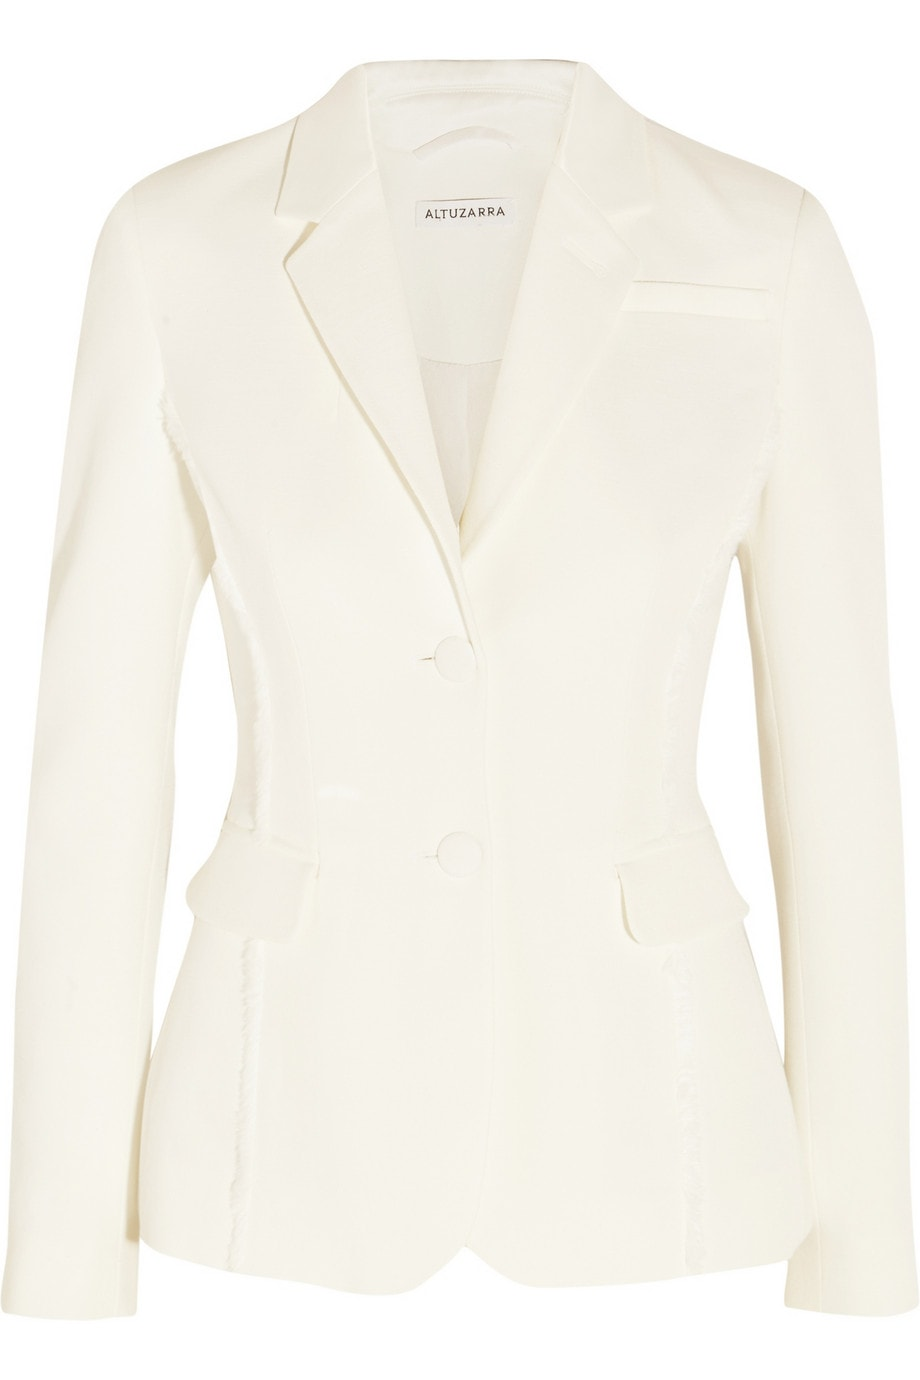 altuzarra giacca bianca